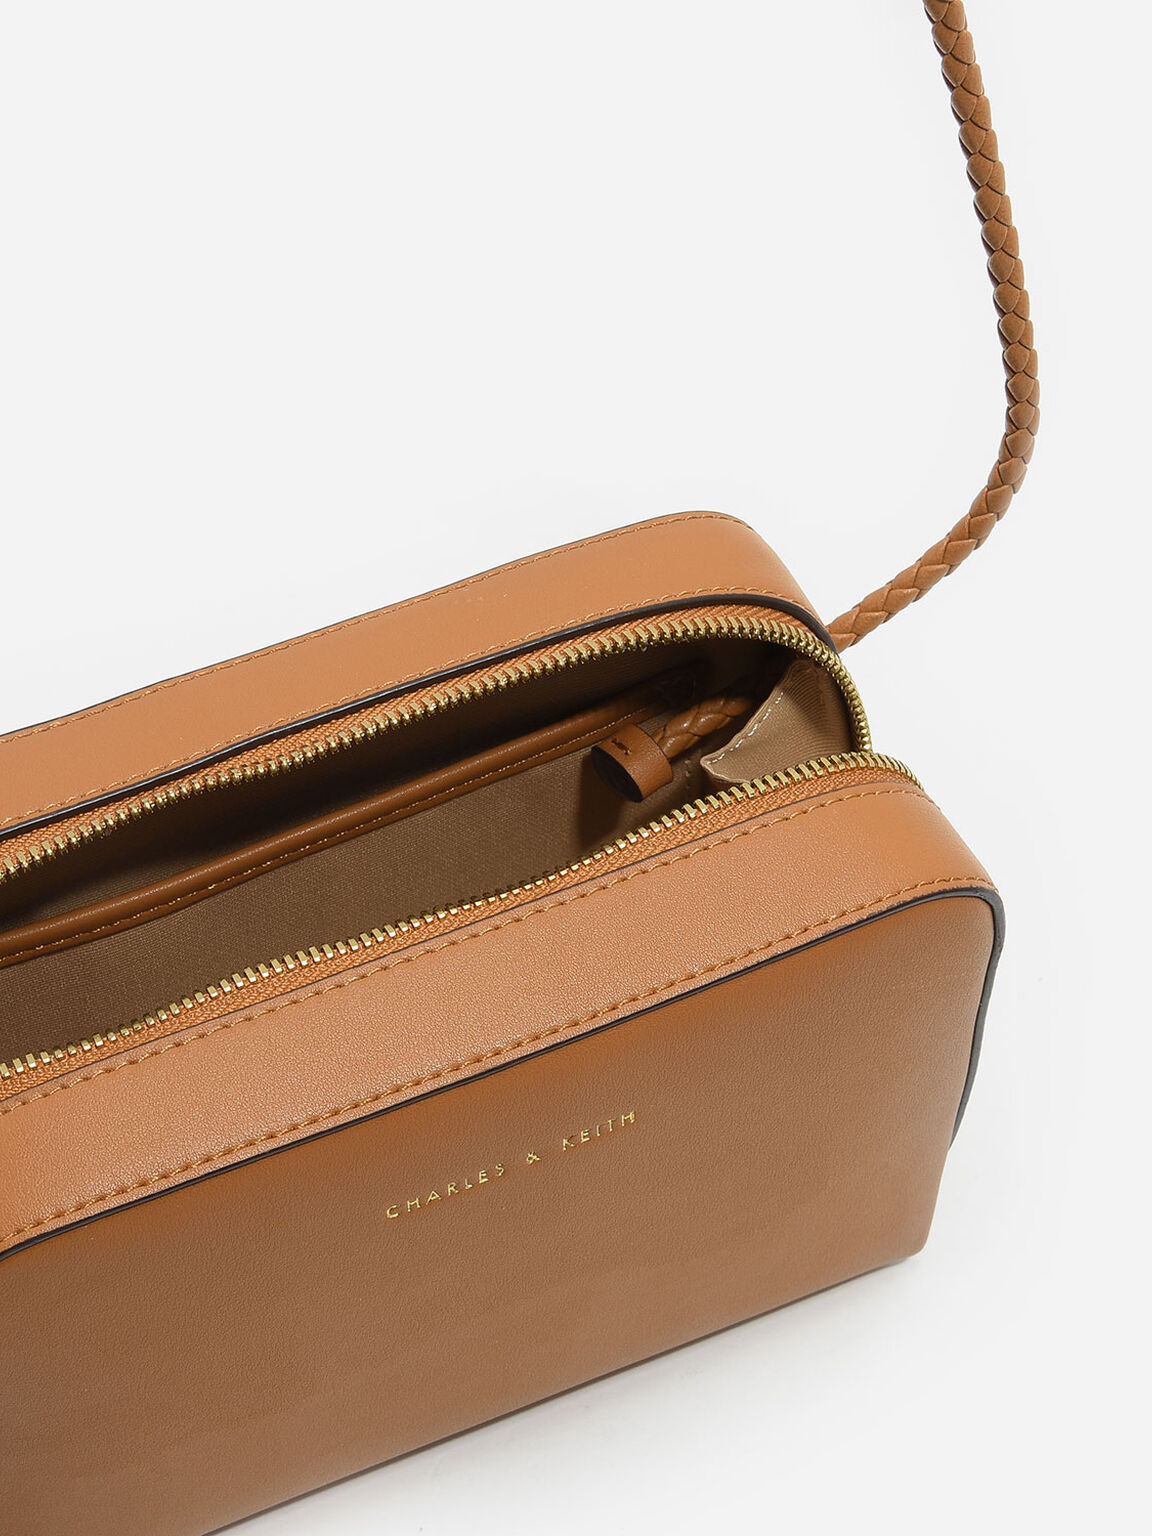 Tassel Sling Bag, Cognac, hi-res